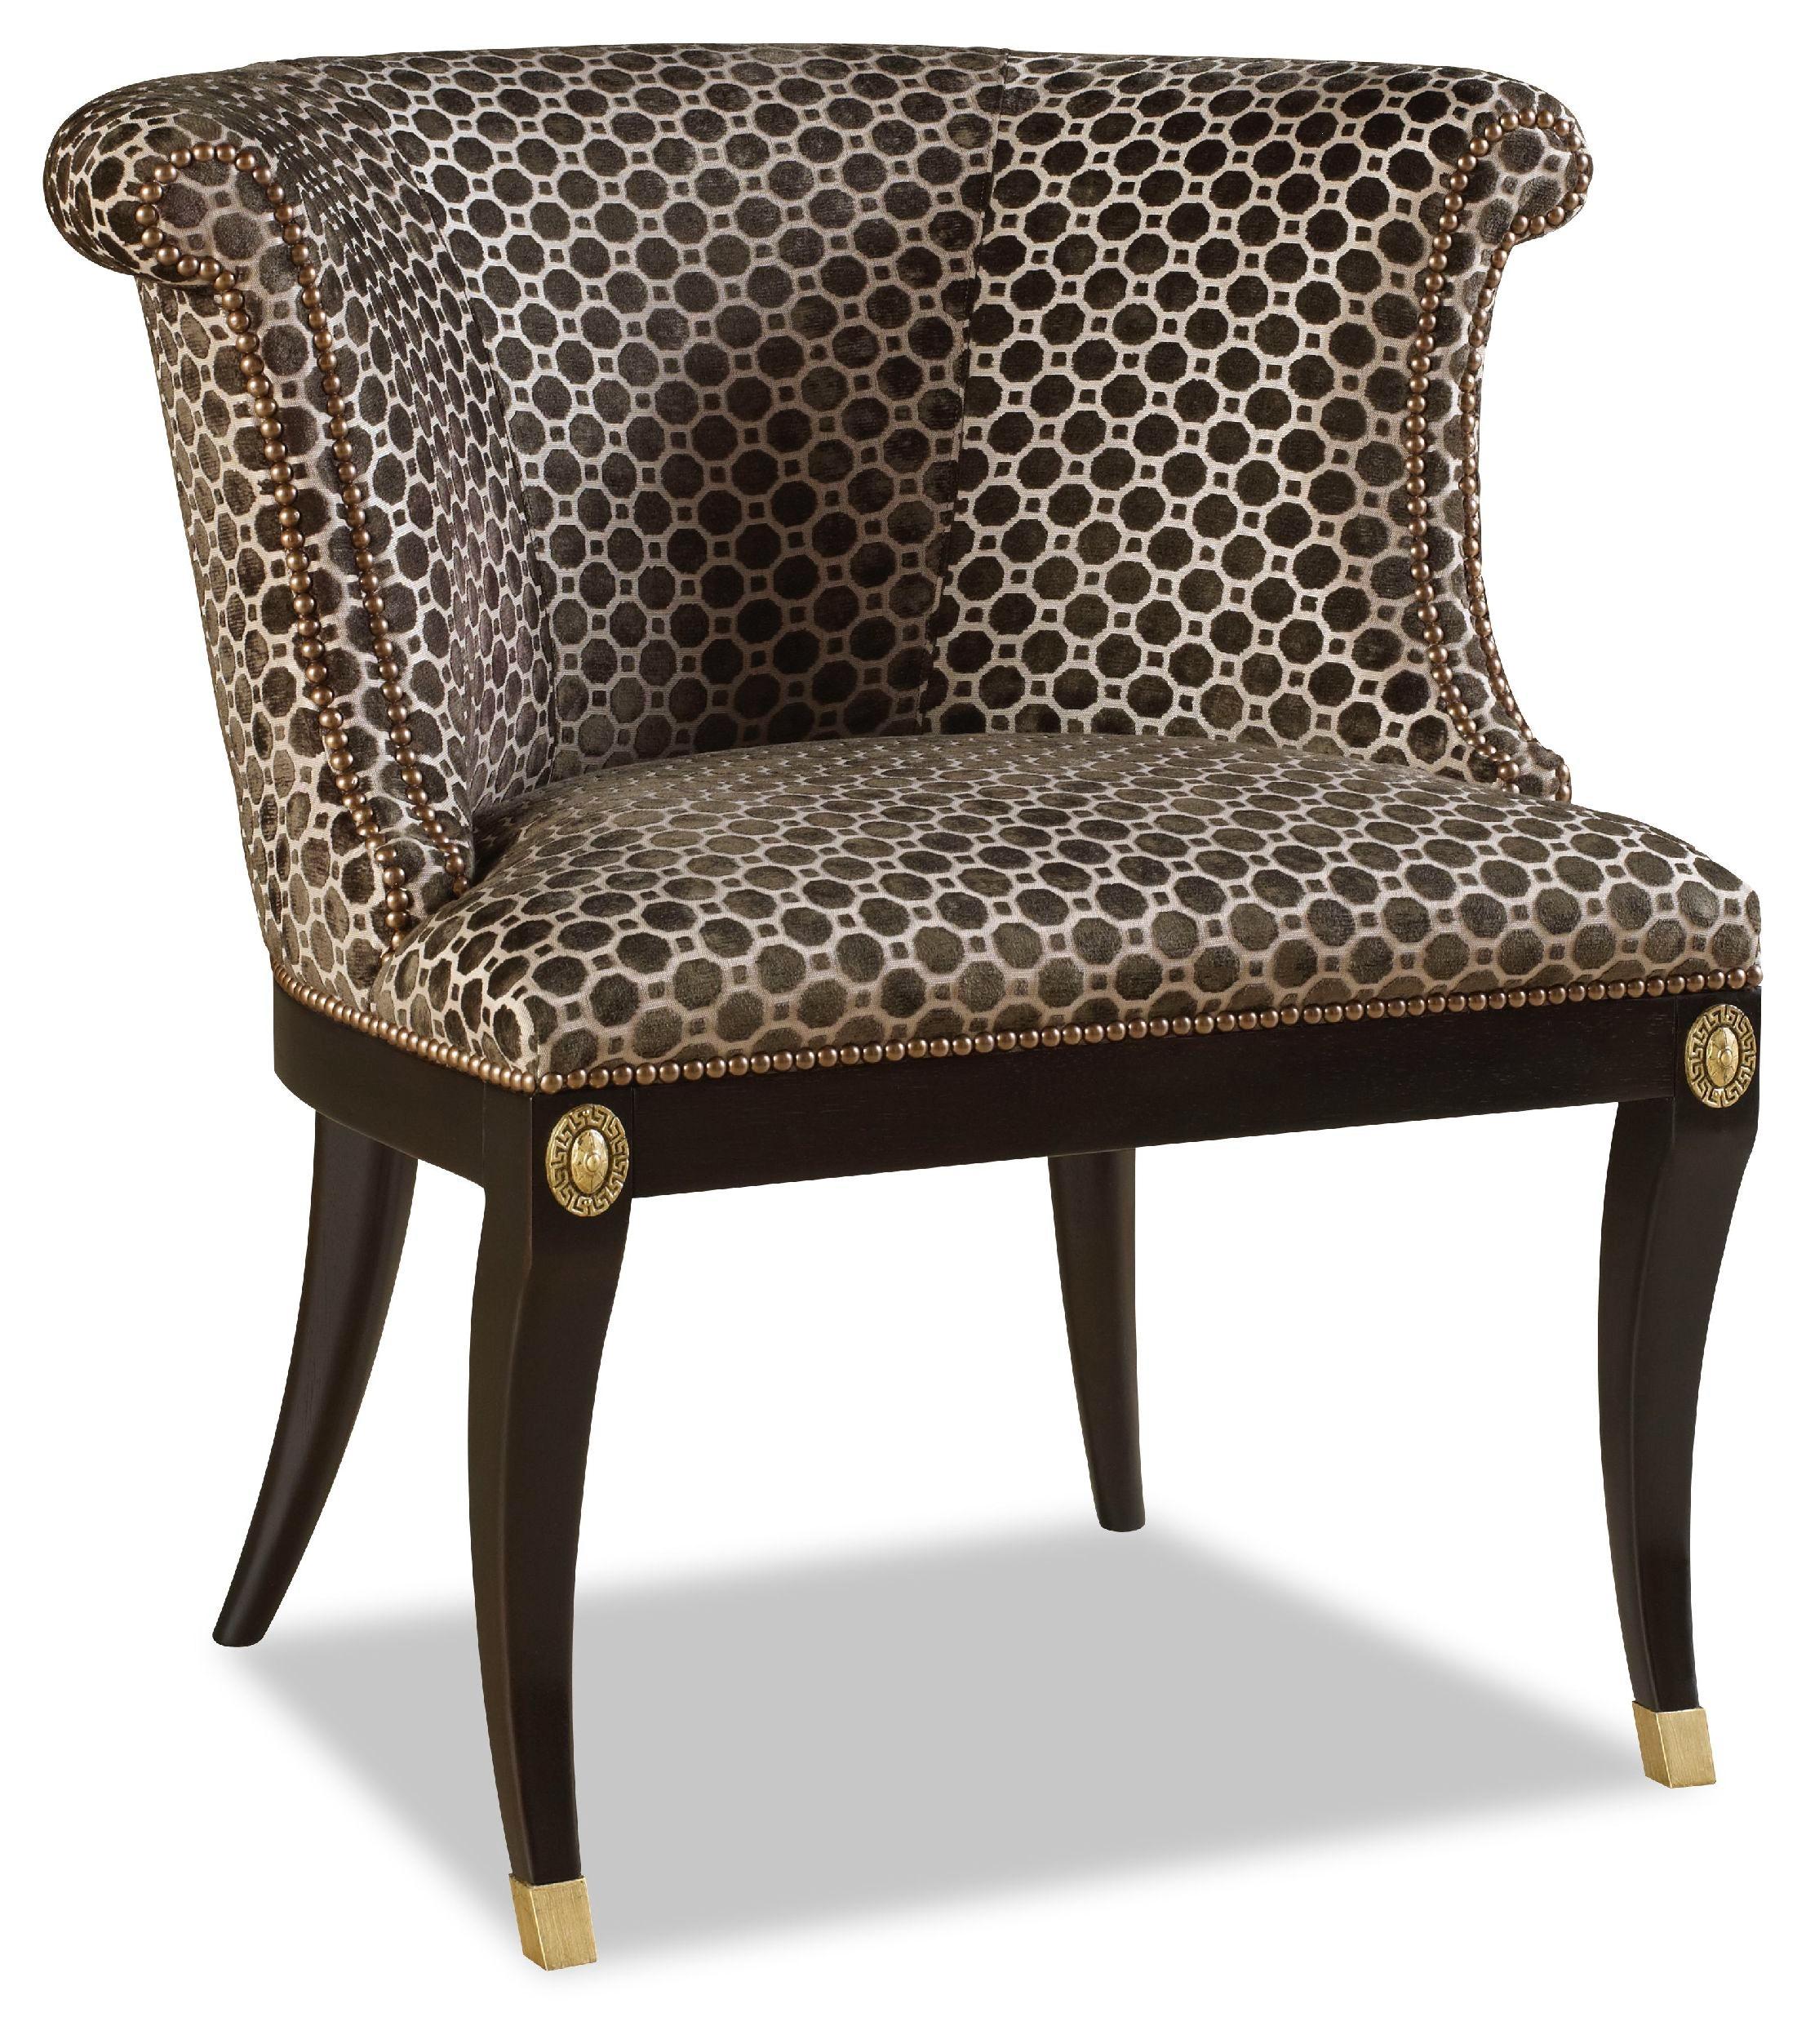 Beau Chaddock Ladd Pull Up Chair Z 1021 26